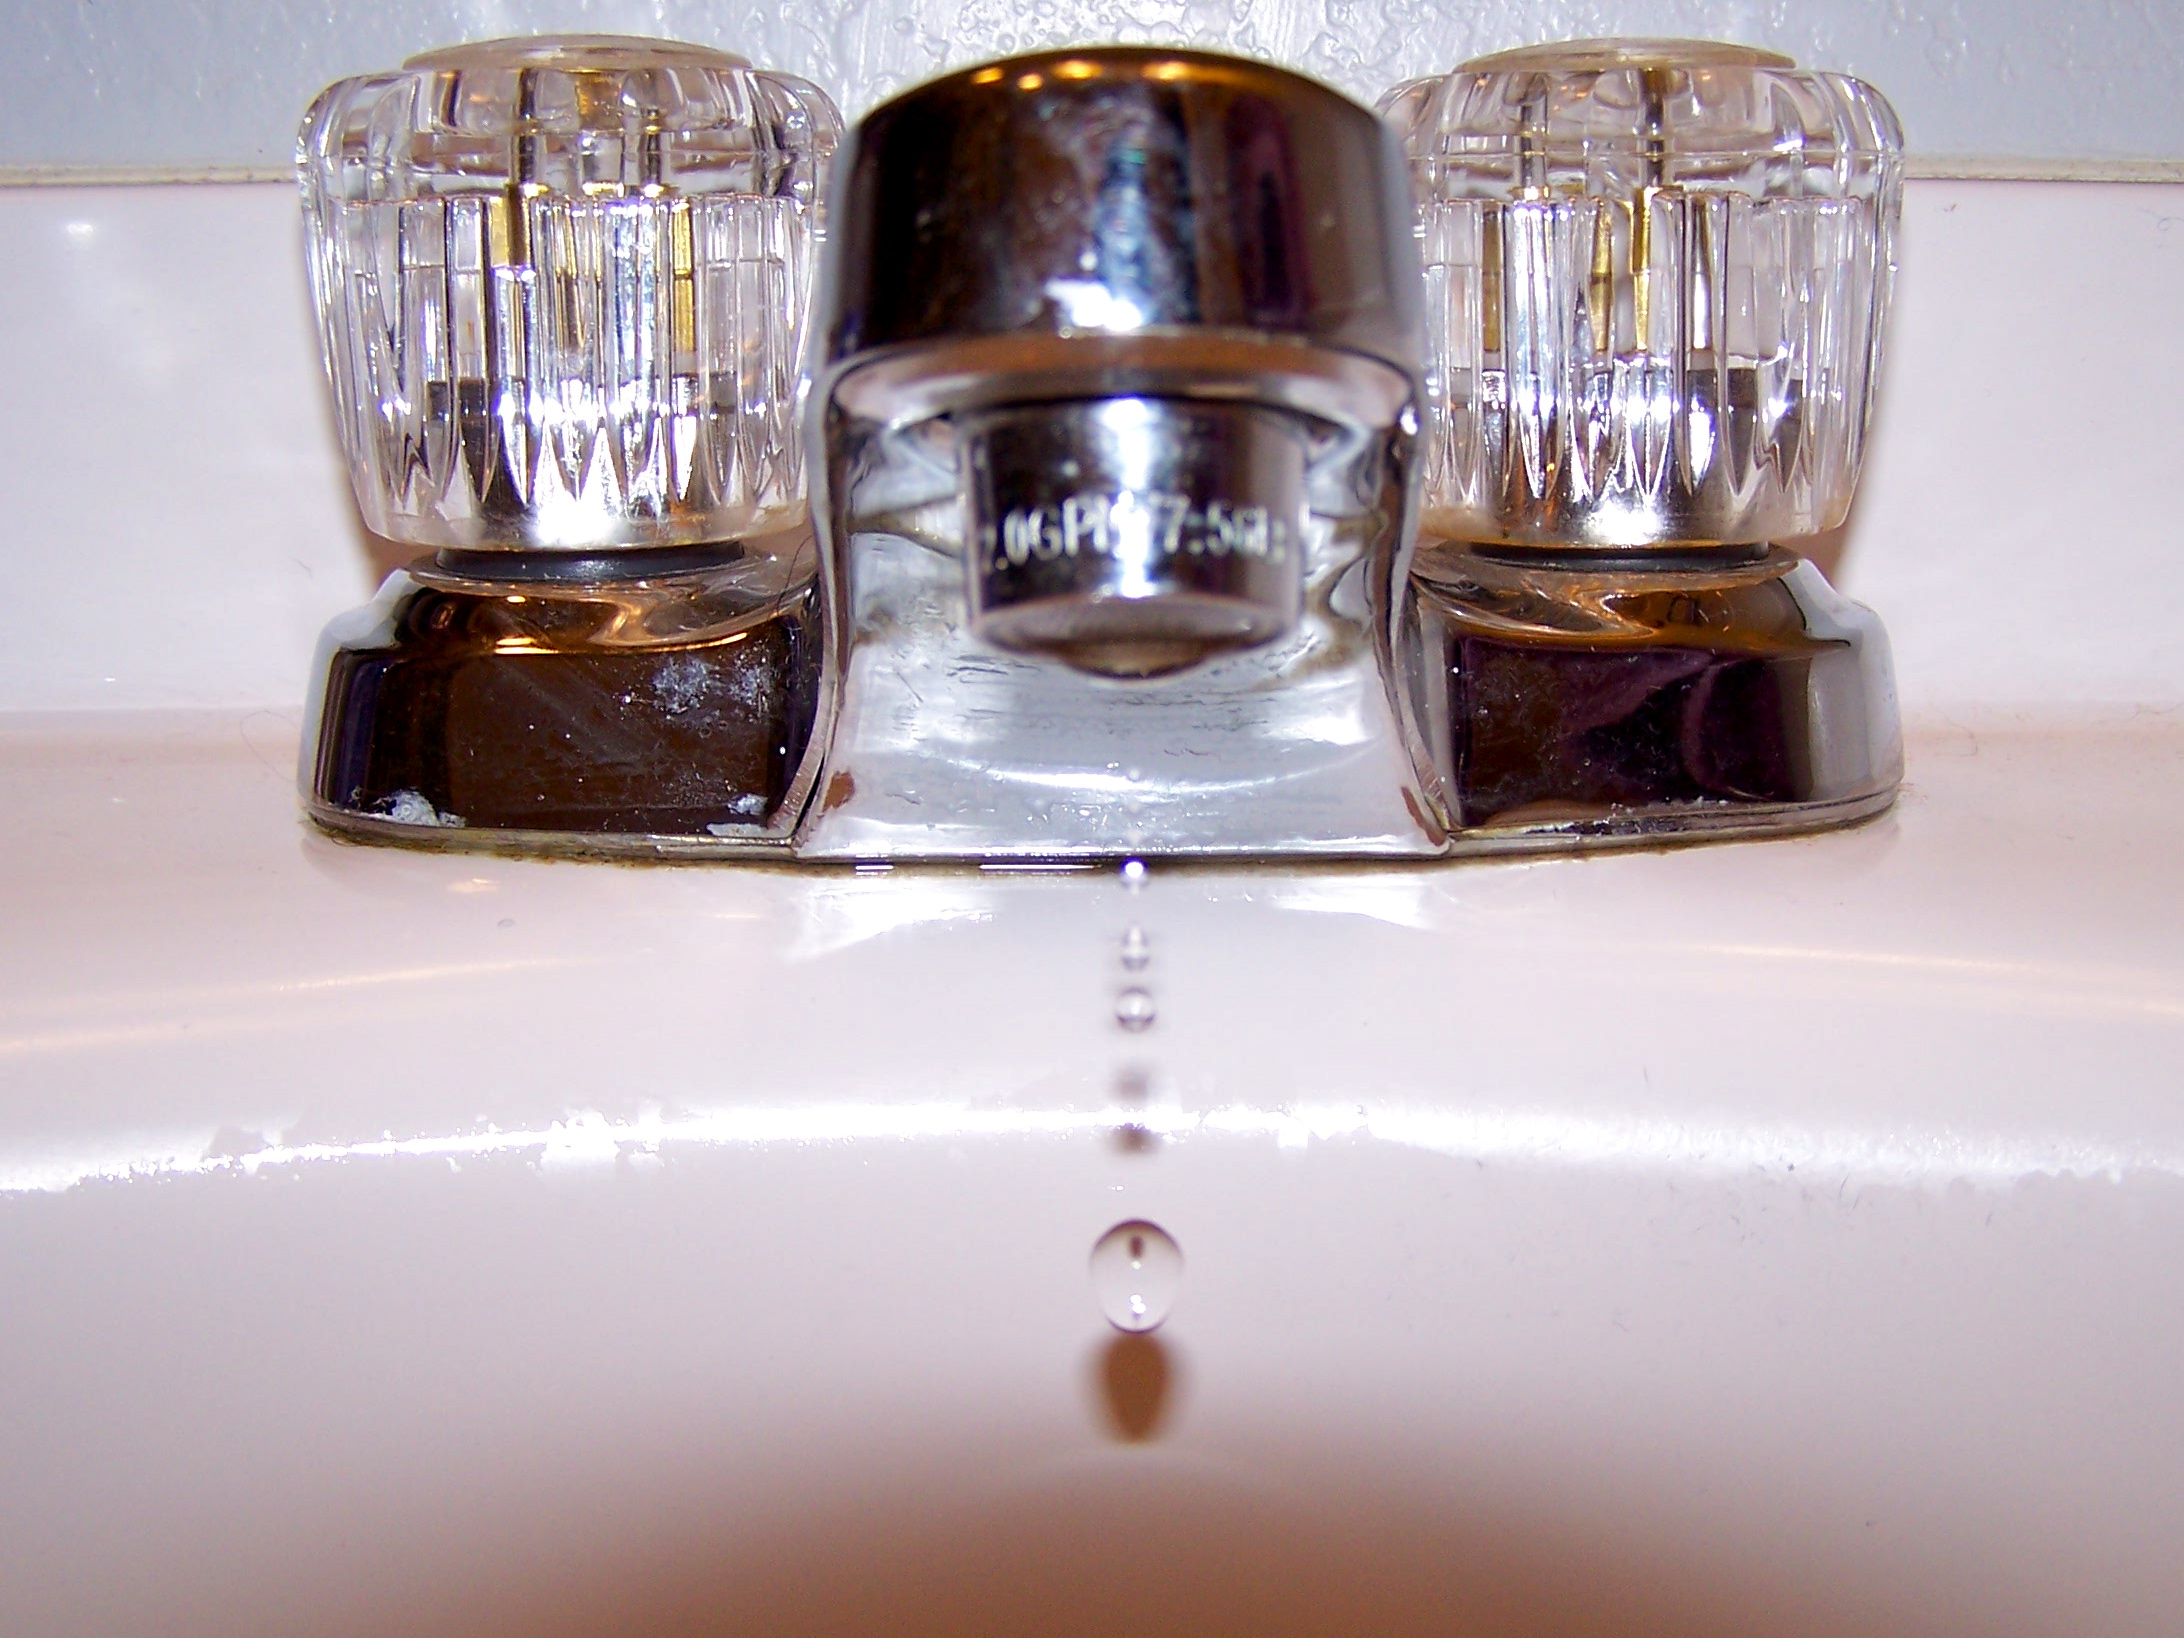 Repair All Leaky Faucets